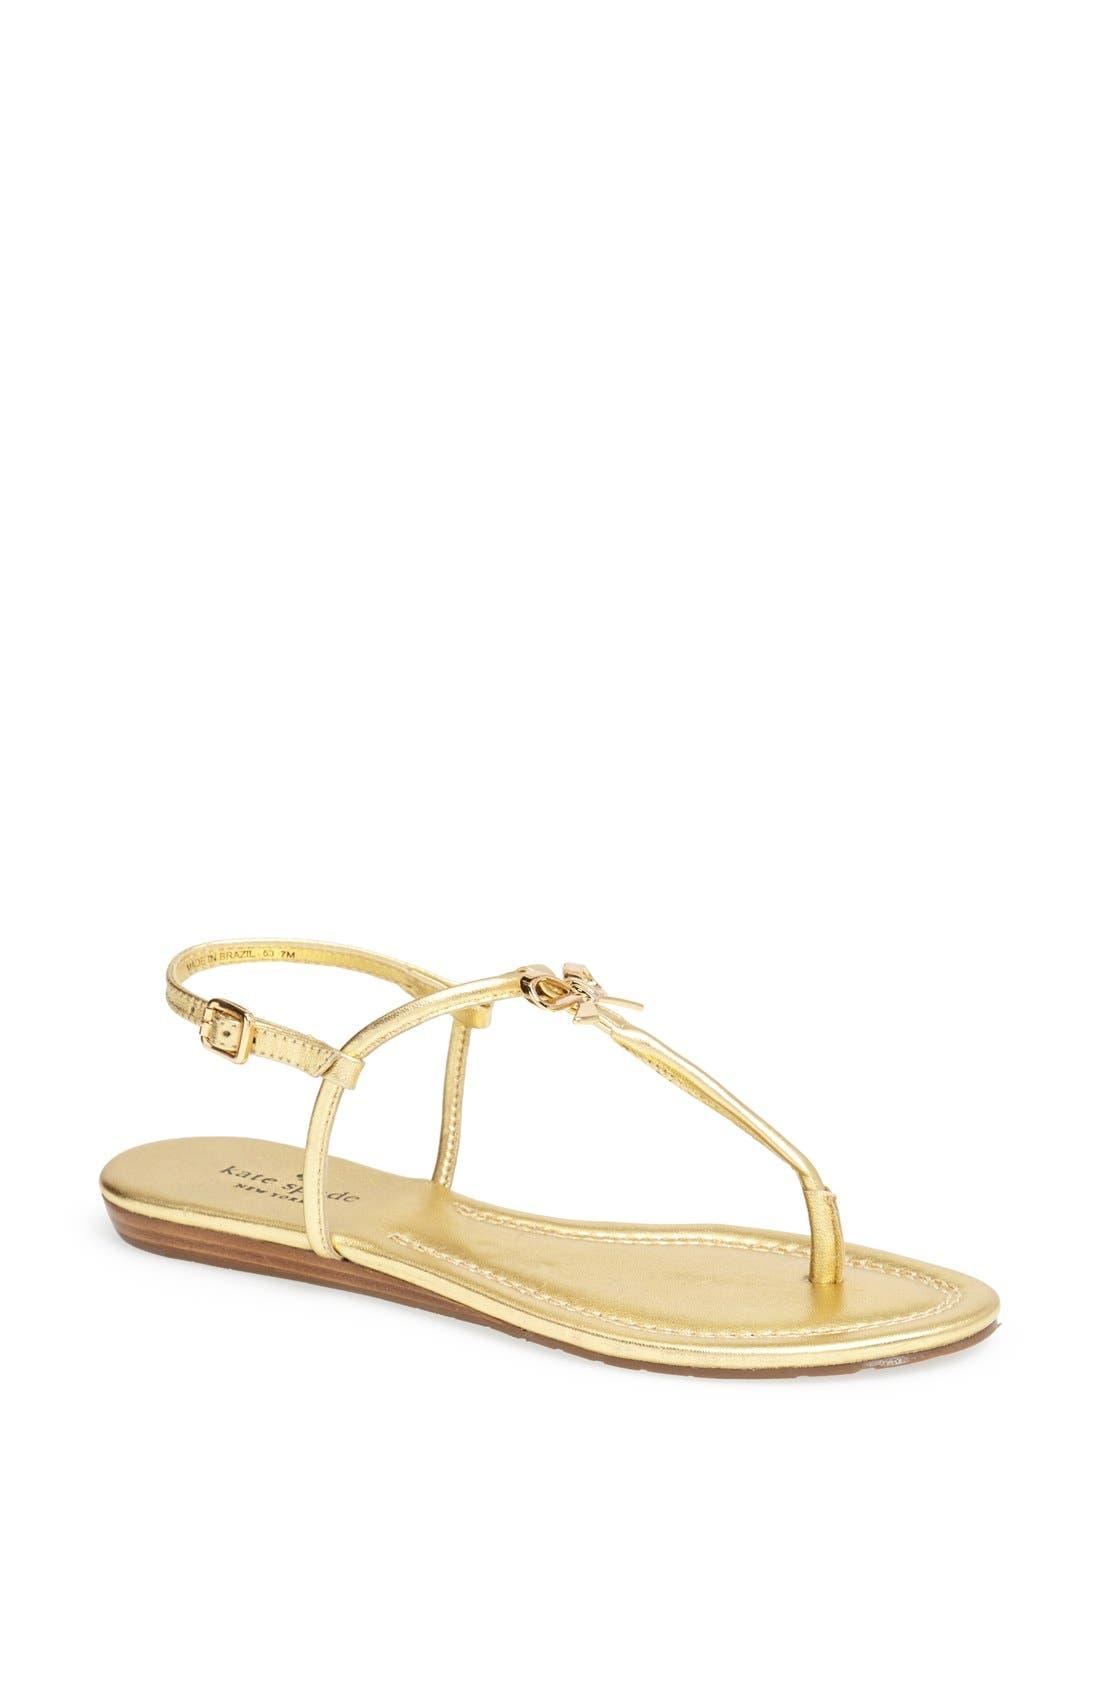 Alternate Image 1 Selected - kate spade new york 'tracie' sandal